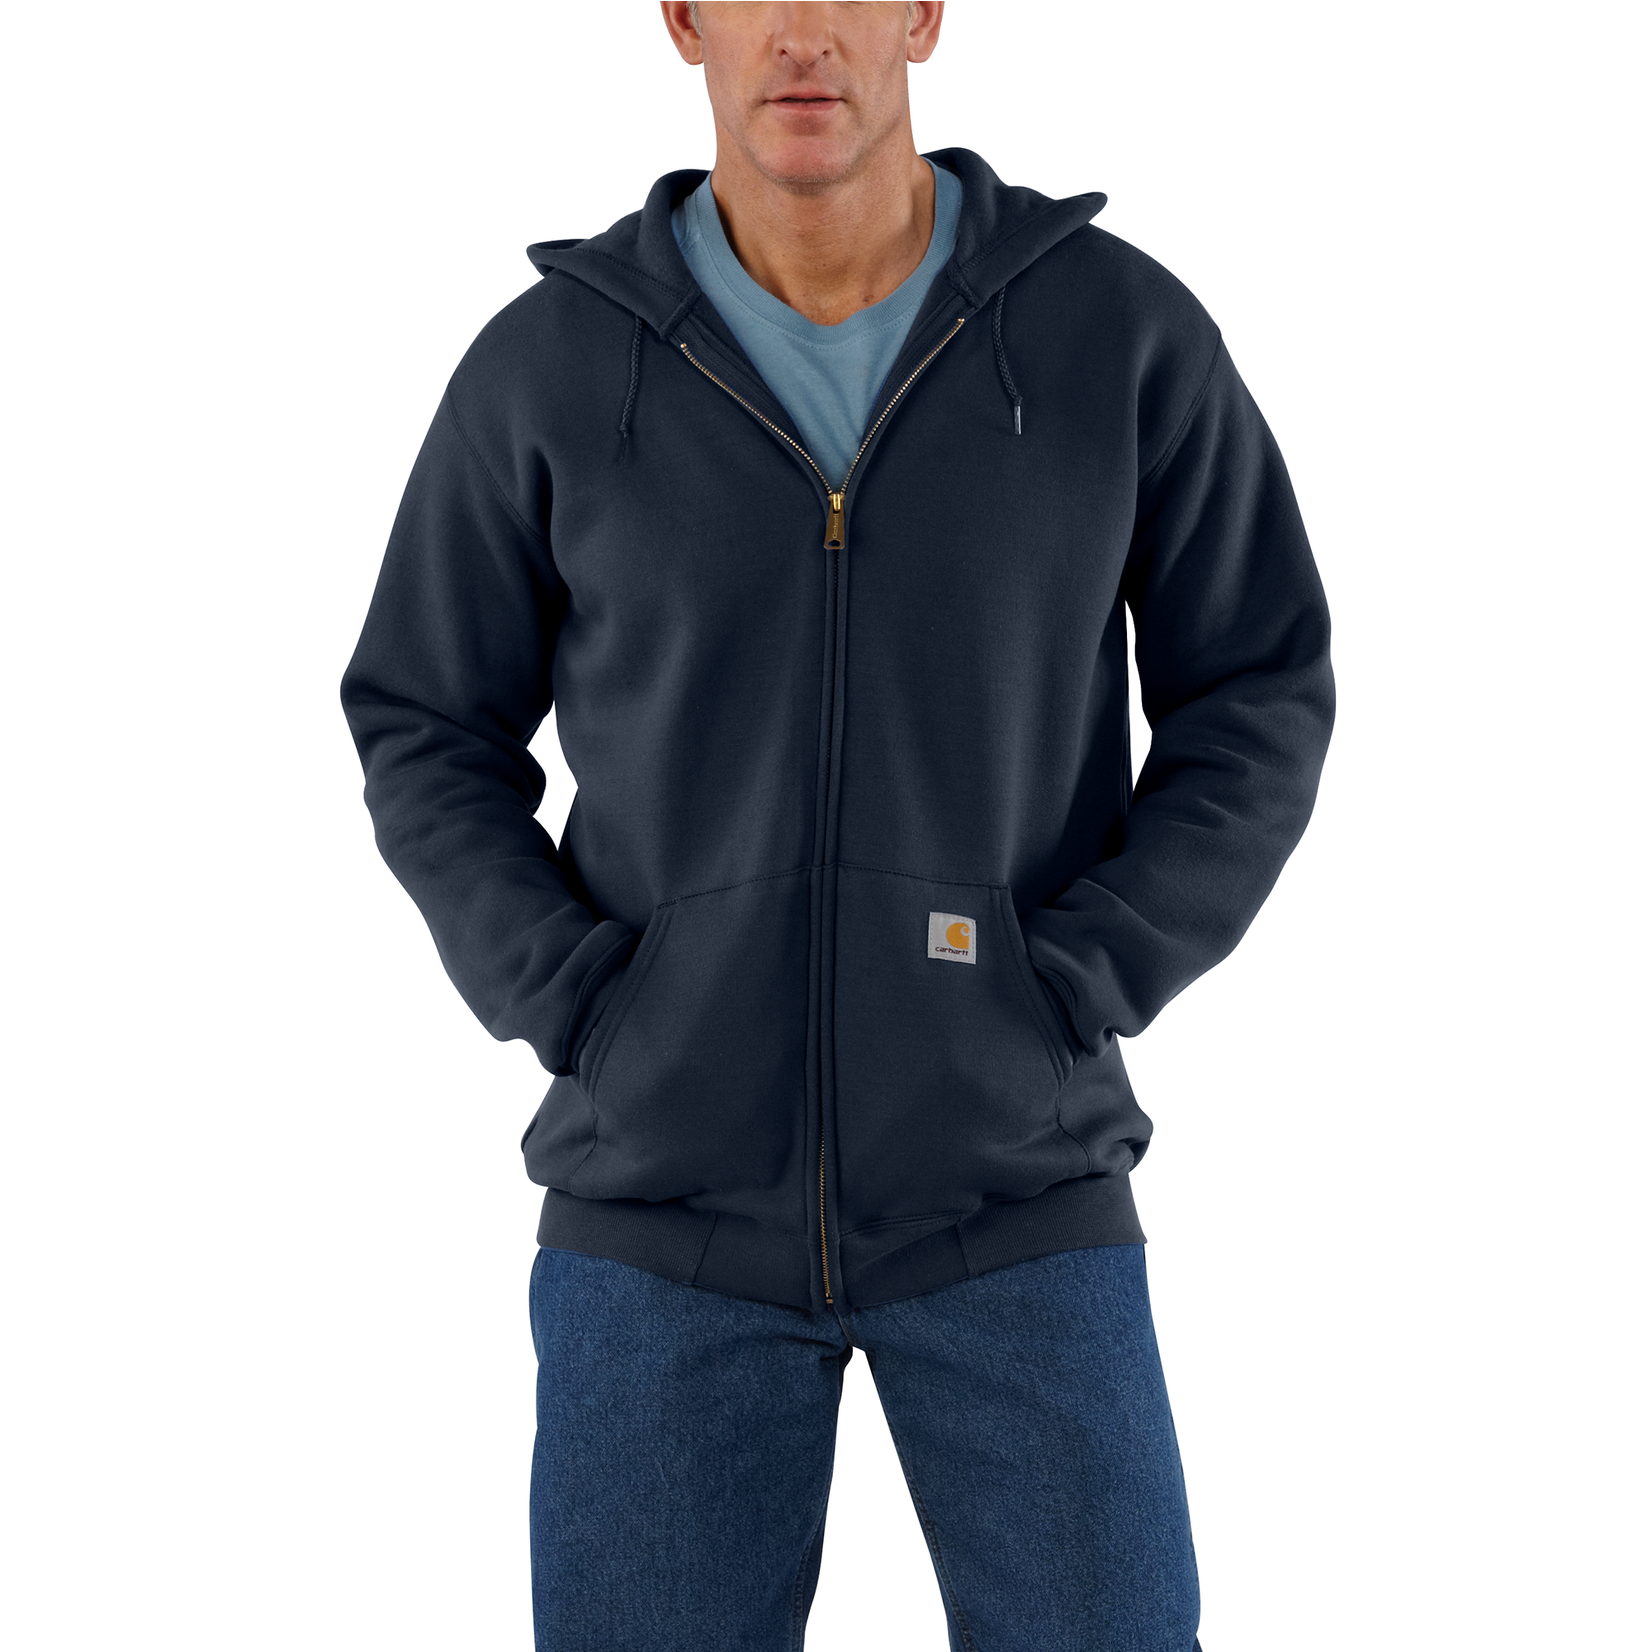 Carhartt Carhartt K122 Loose-Fit Midweight Full-Zip Hooded Sweatshirt - 472 New Navy